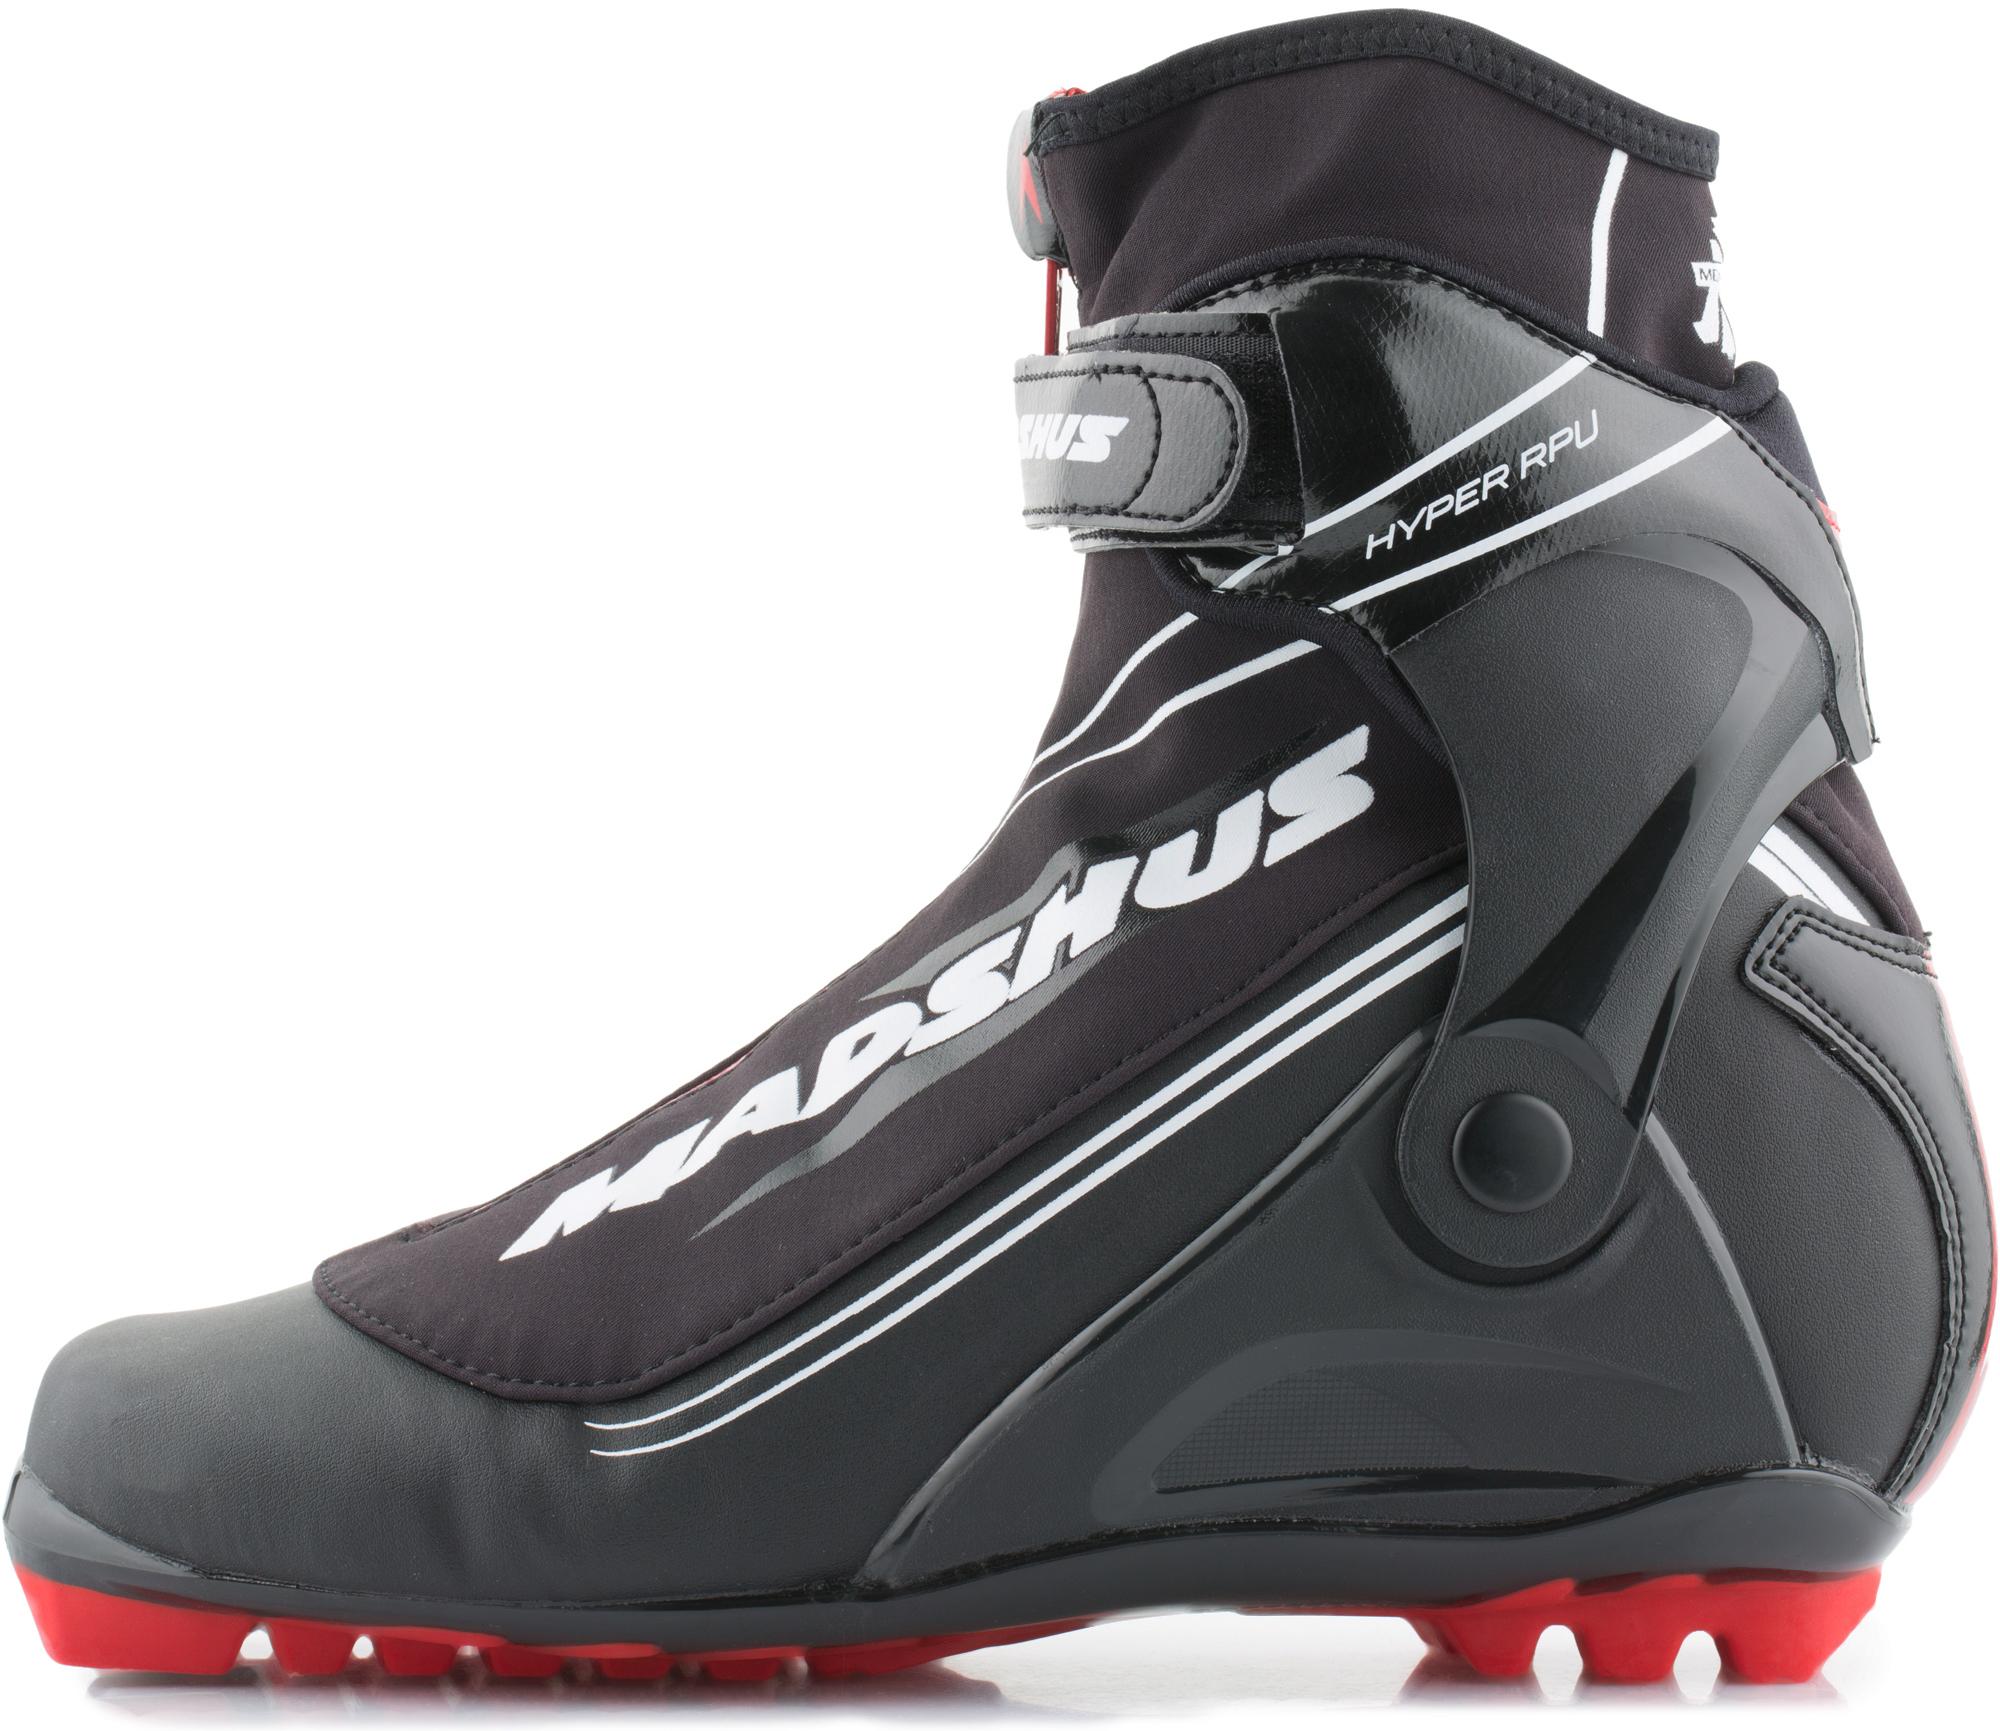 Madshus Ботинки для беговых лыж Madshus Hyper RPU цена